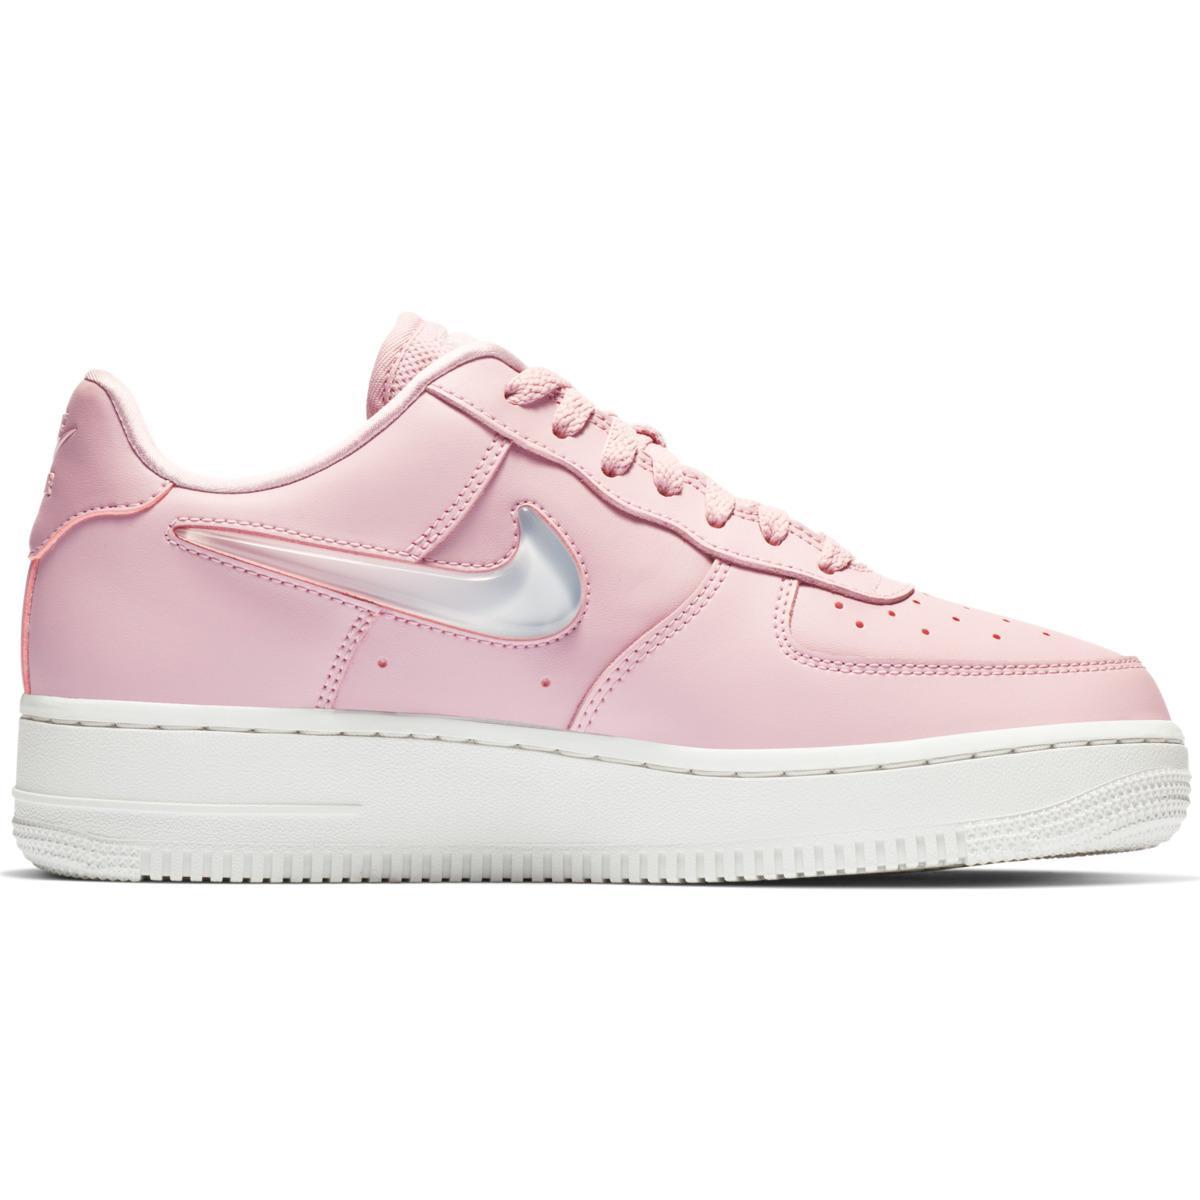 7fddaad34b9be Nike - Pink Air Force 1 07 Se Premium Casual Trainers - Lyst. View  fullscreen